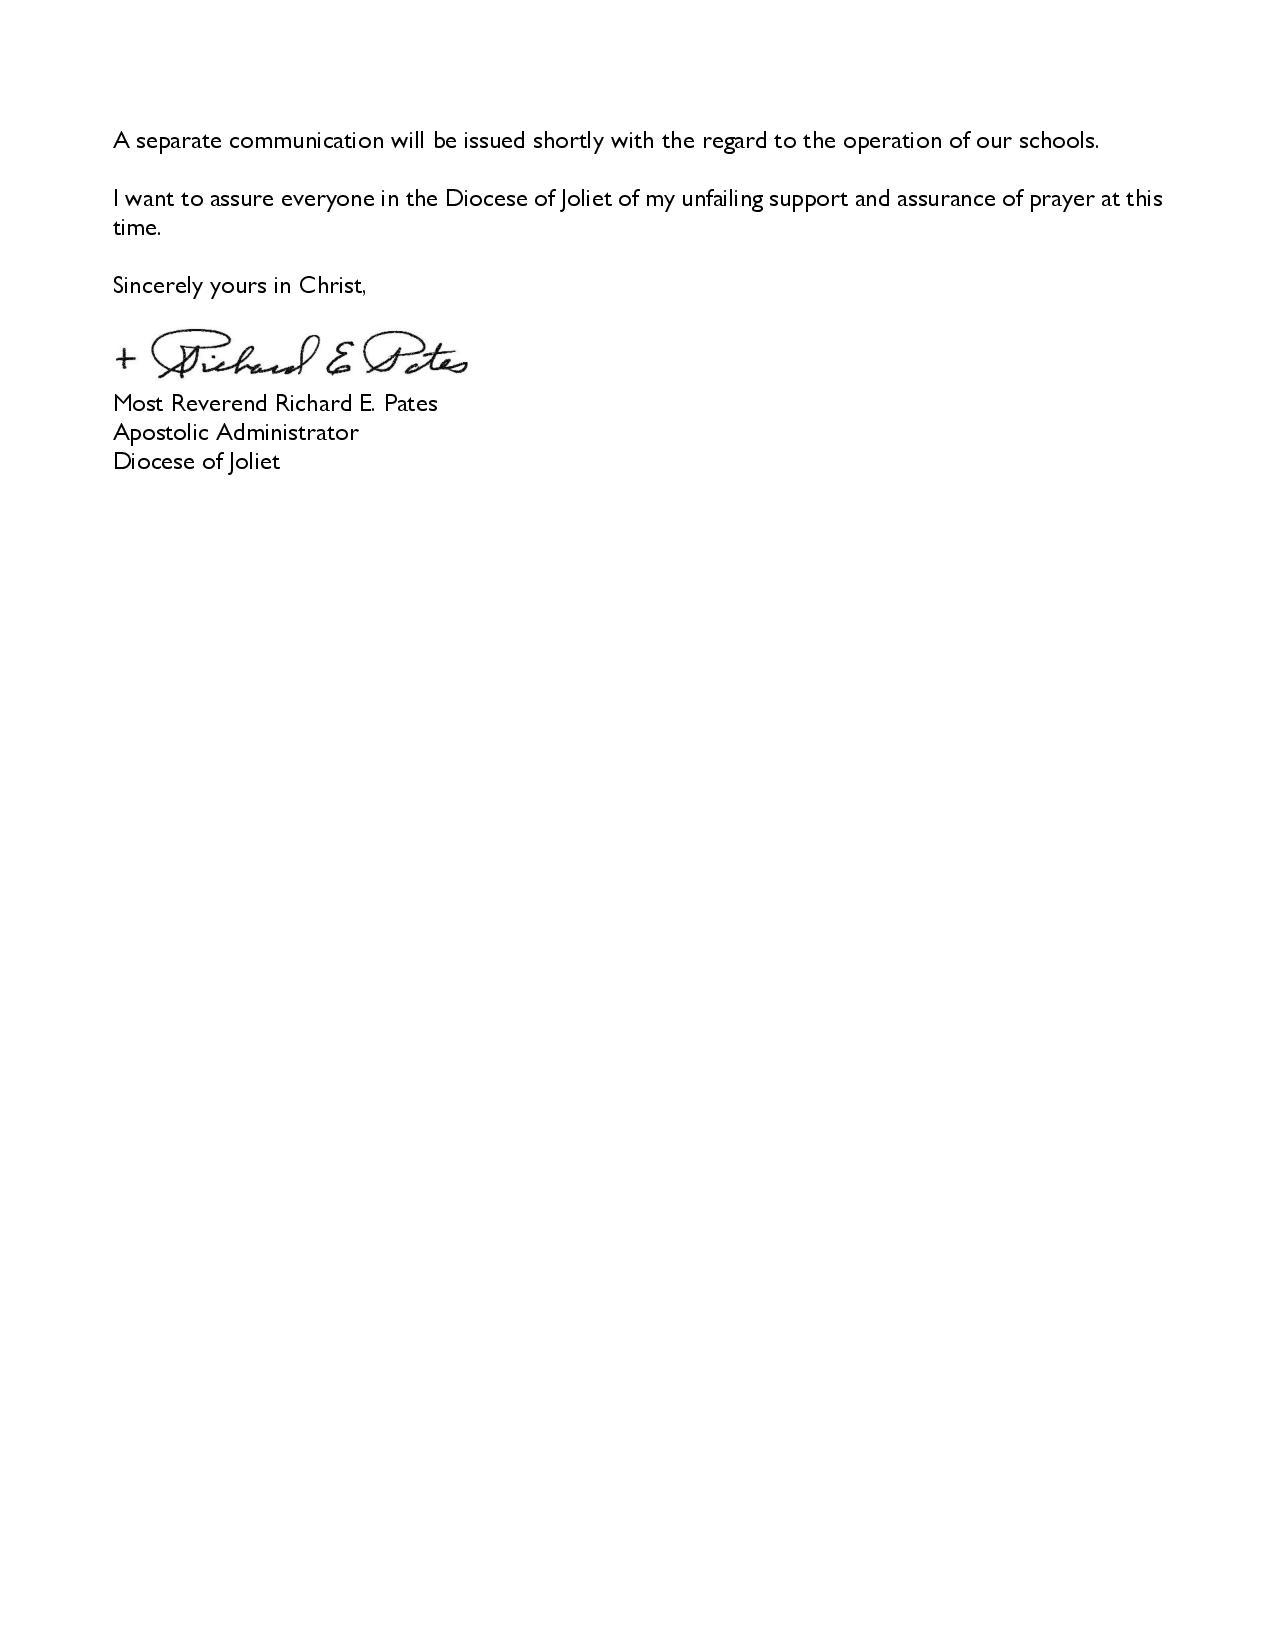 Statement-03.13.2020-COVID19.pdf-page-002